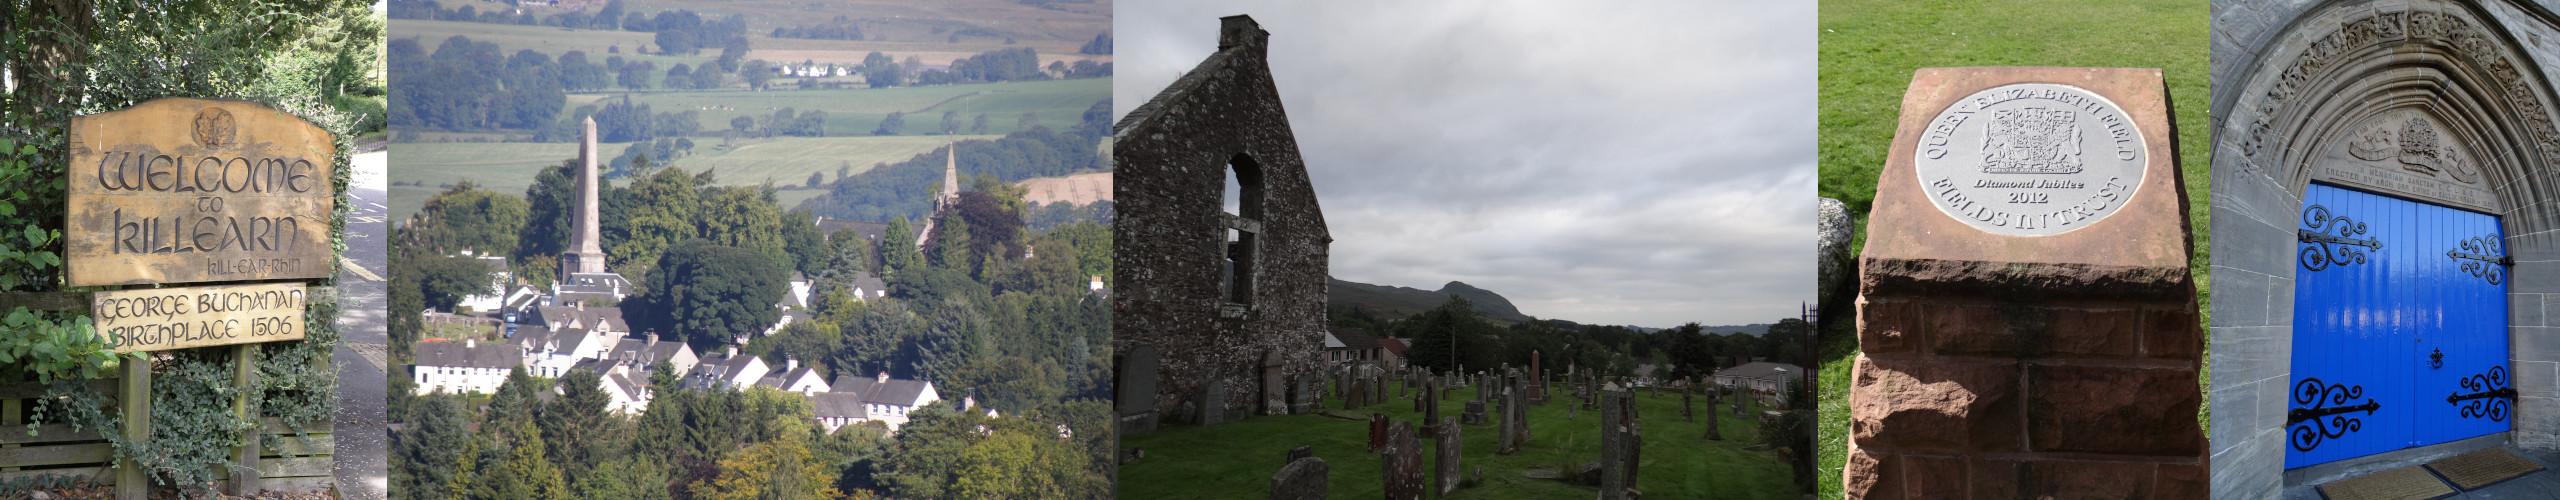 Killearn, Scotland